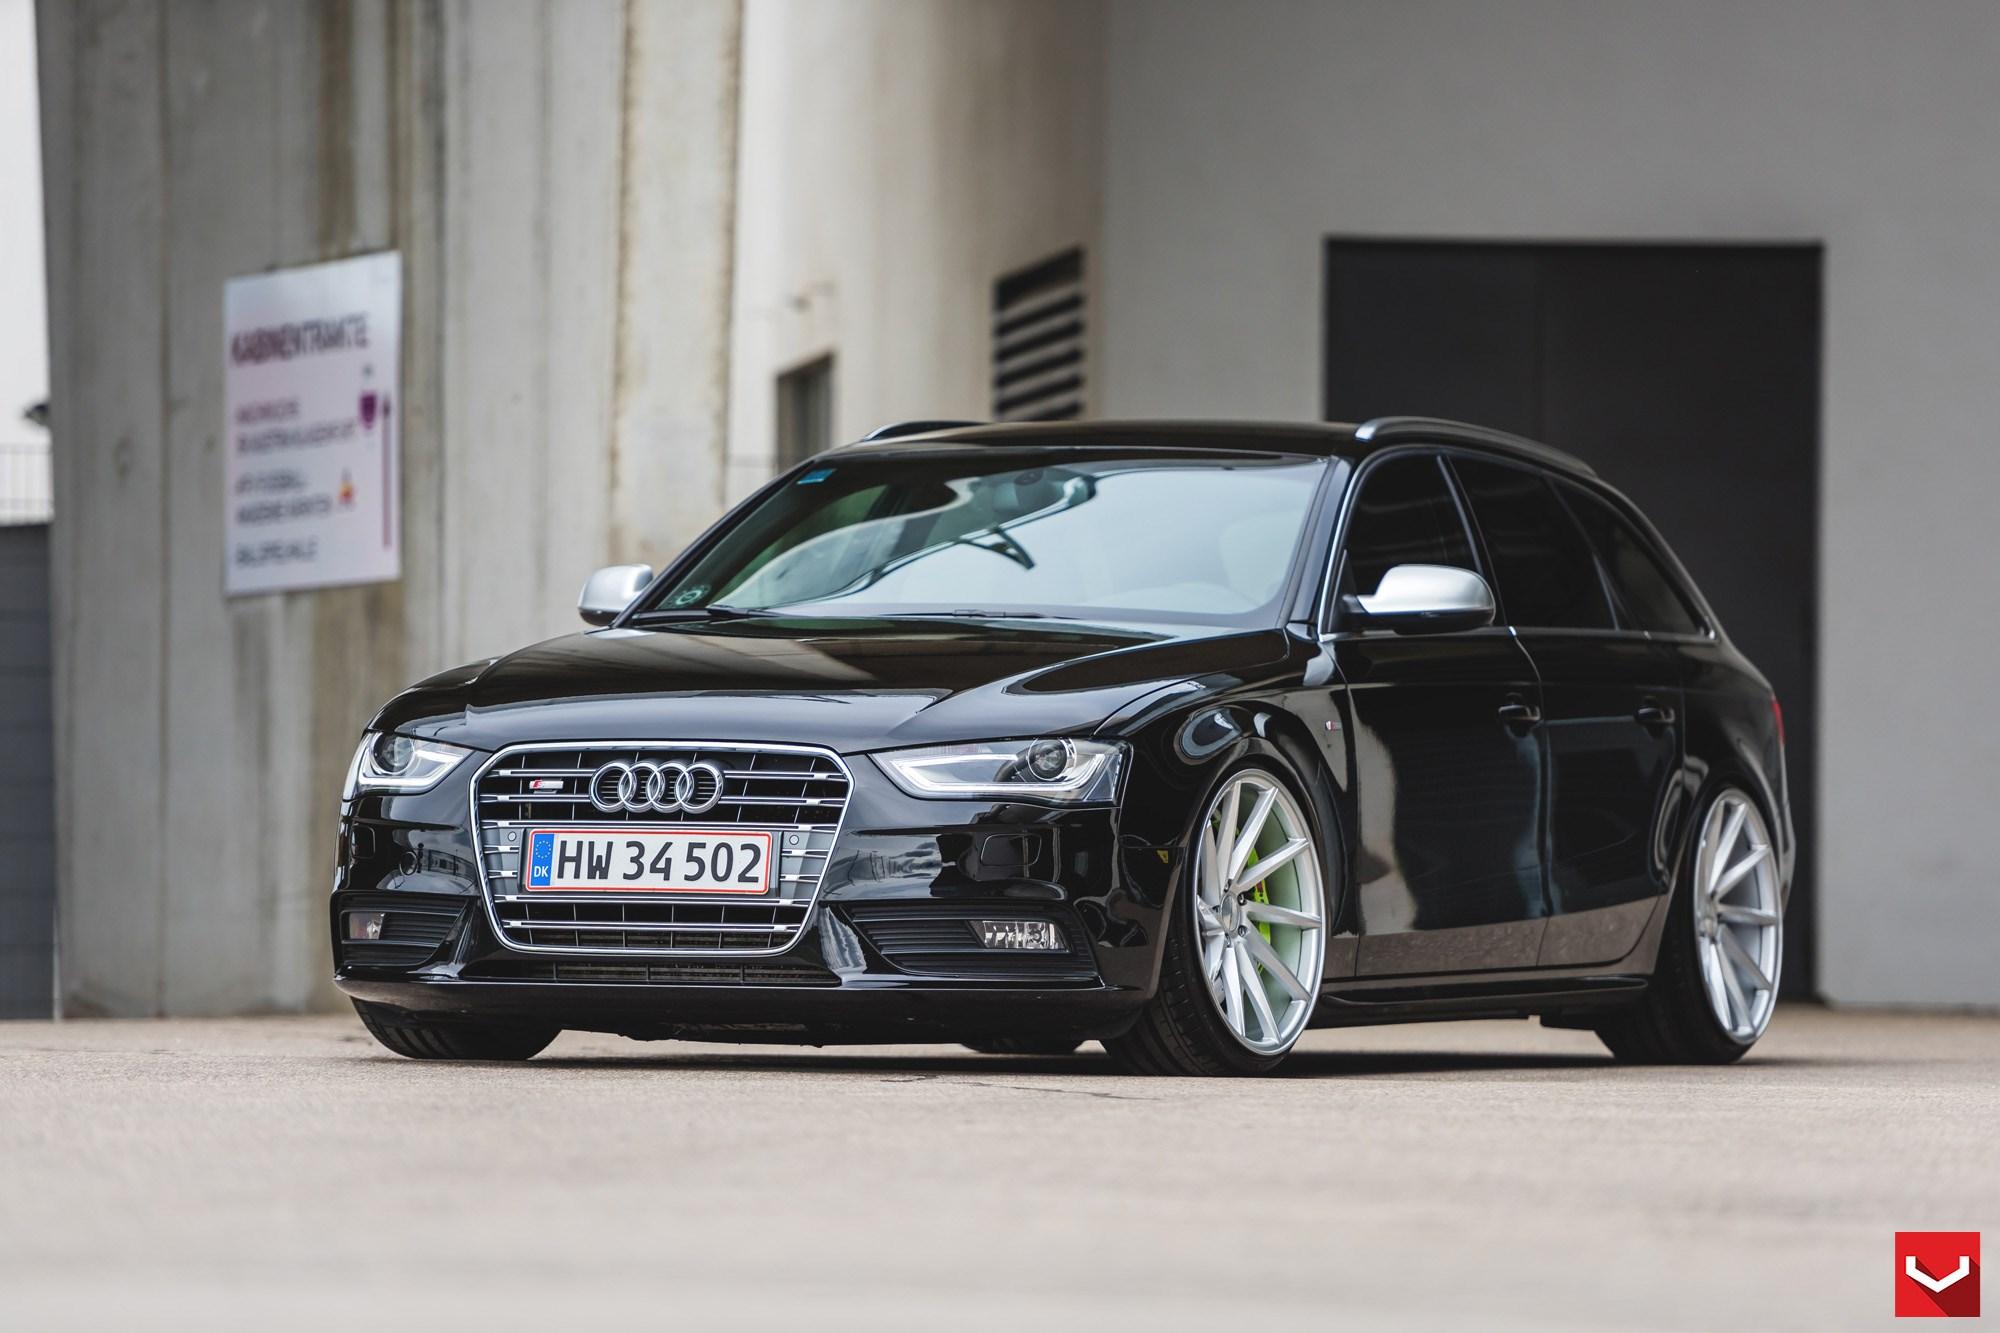 Audi A4 S4 Rs4 Vossen Cvt Vossen Wheels